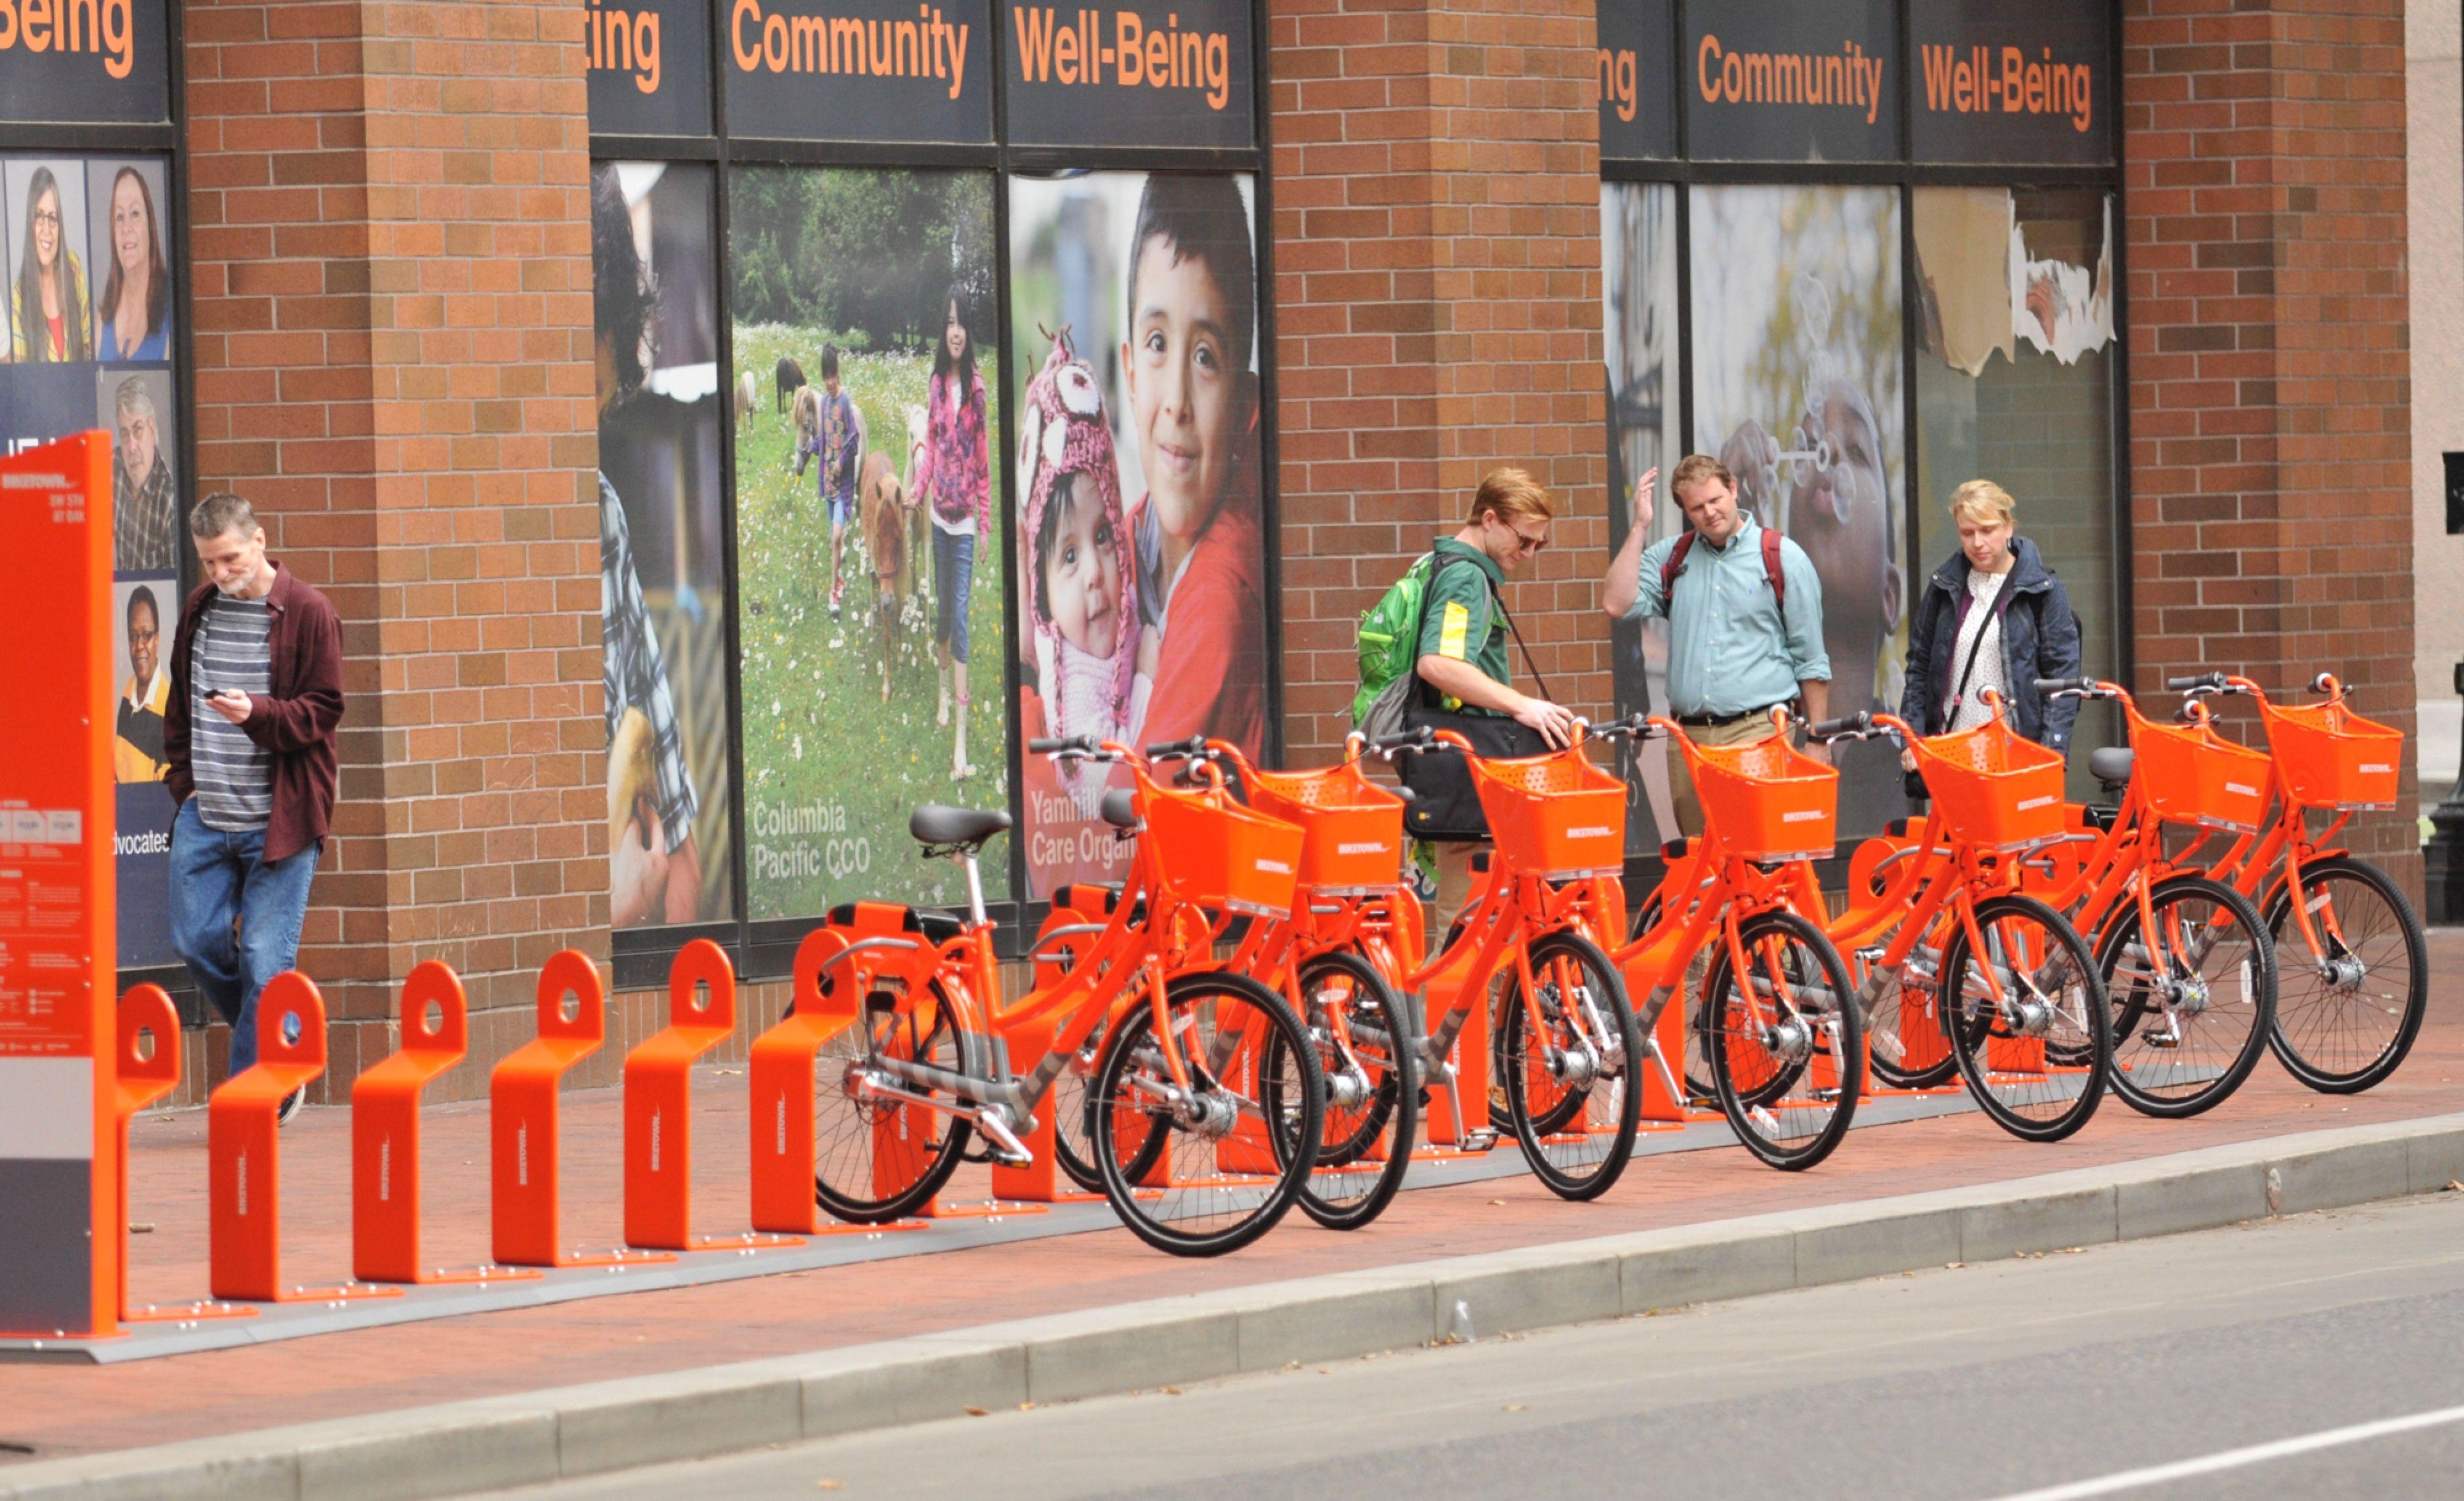 nike biketown portland에 대한 이미지 검색결과